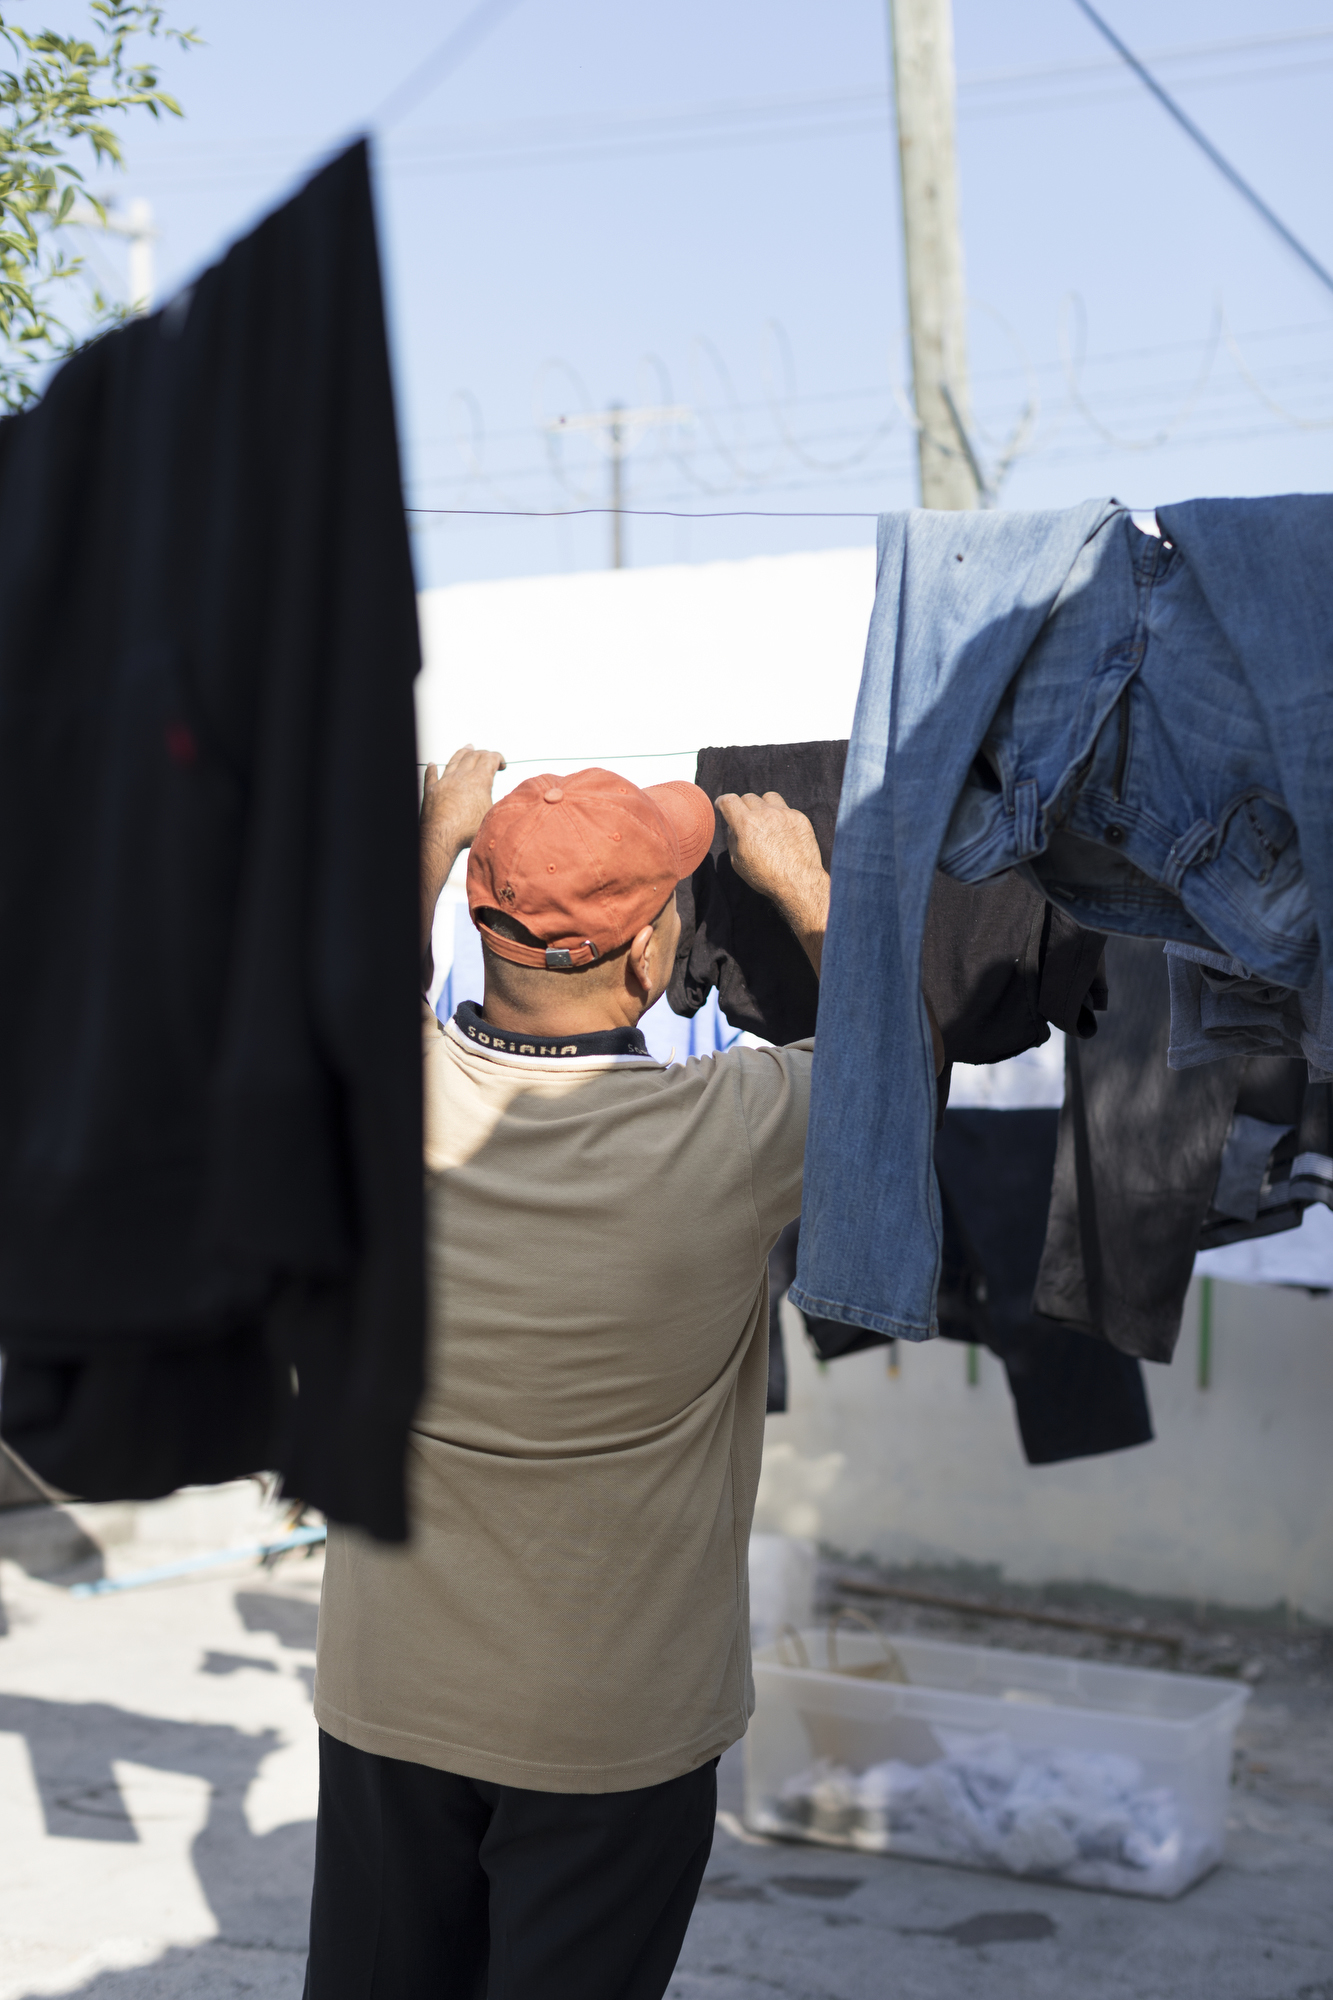 Miguel checks his laundry at the Casa del Migrante in Reynosa. MUST CREDIT: Photo by Alejandro Cartagena for The Washington Post.